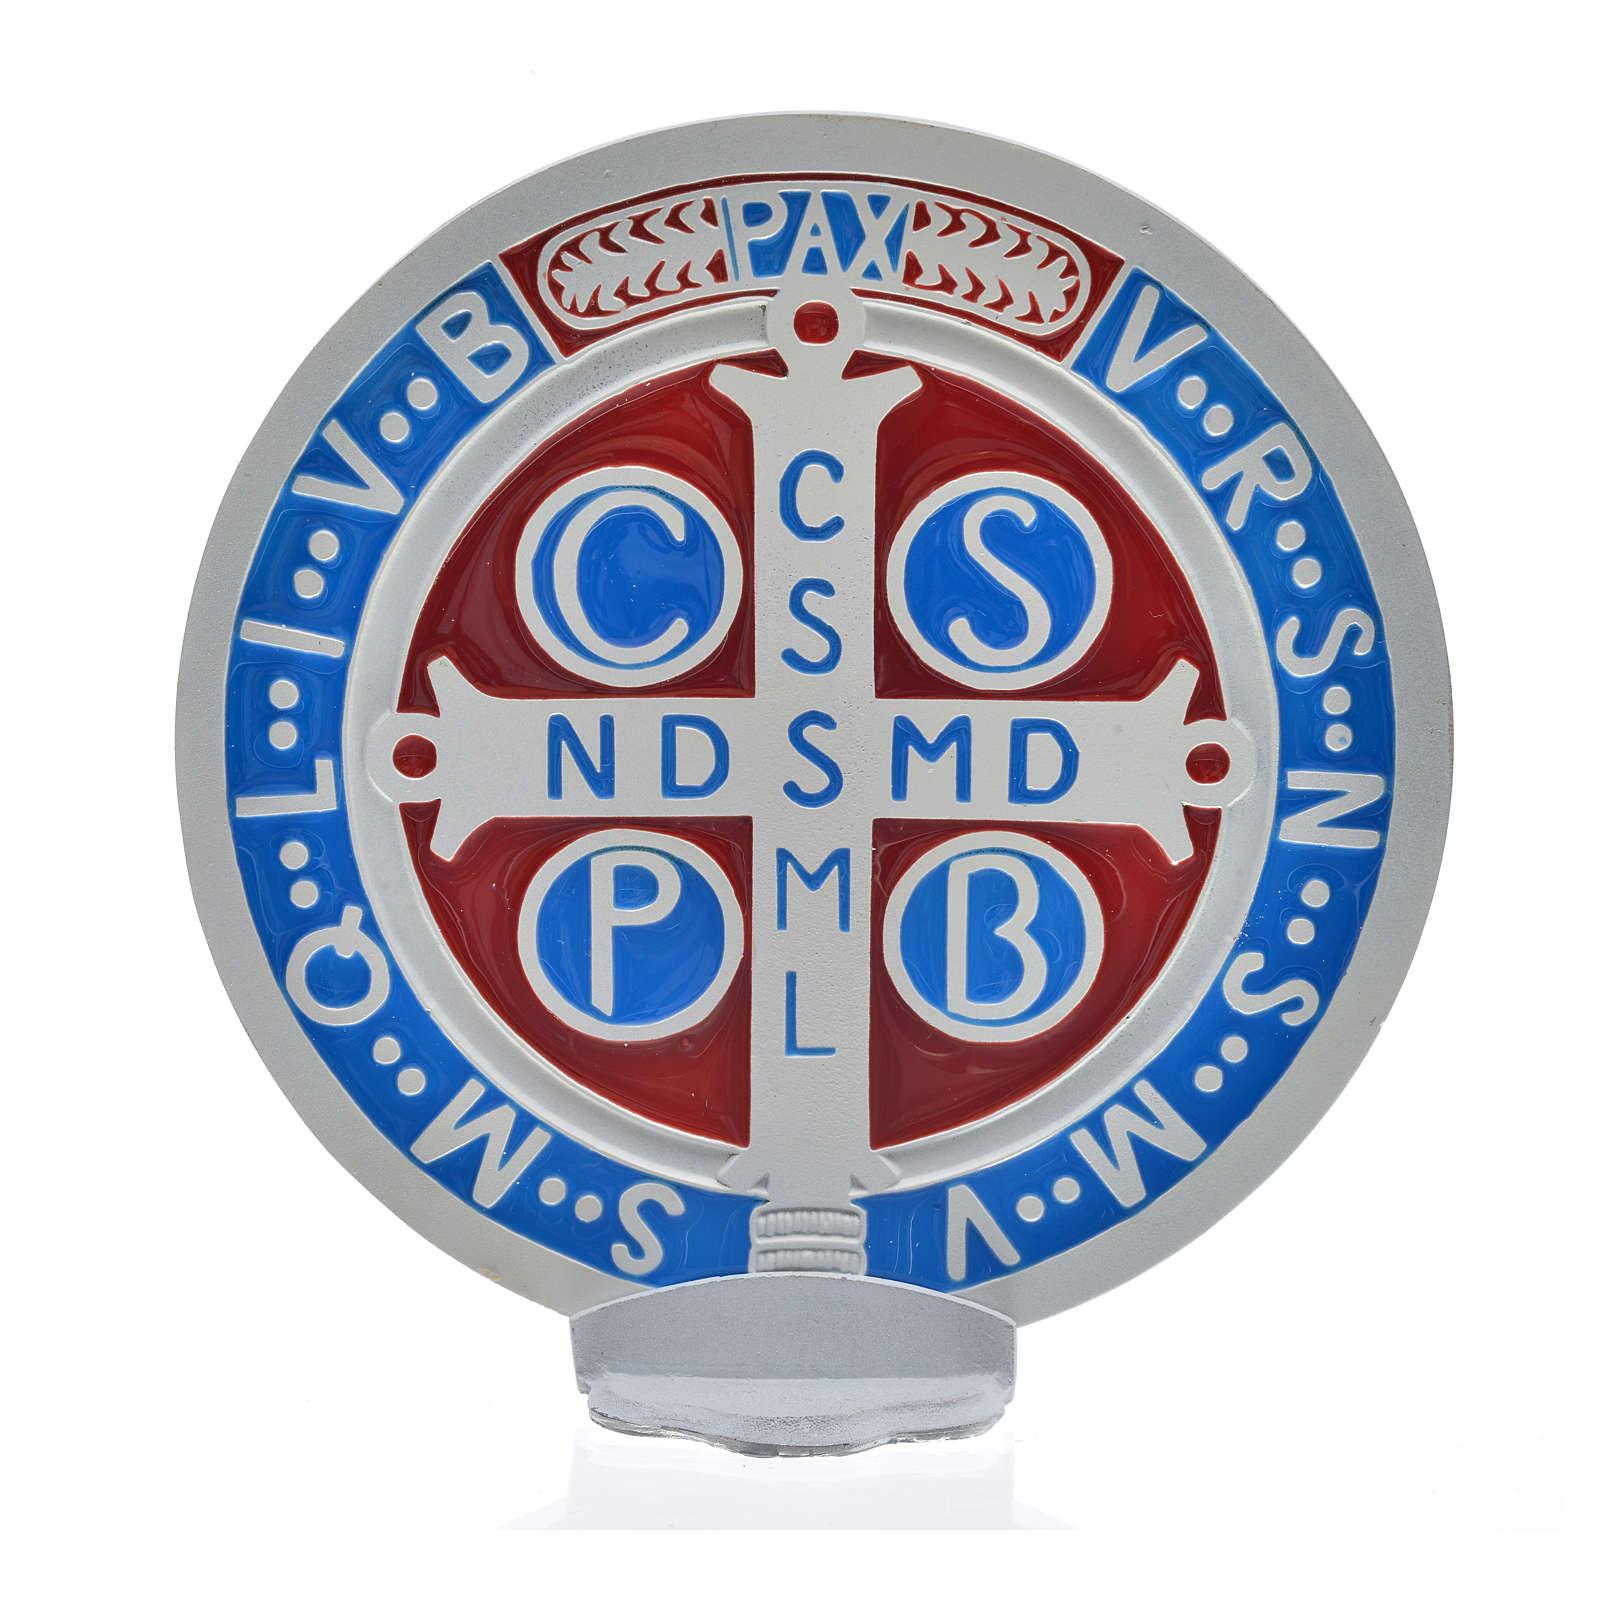 Medalha cruz São Bento zamak branco 12,5 cm 4